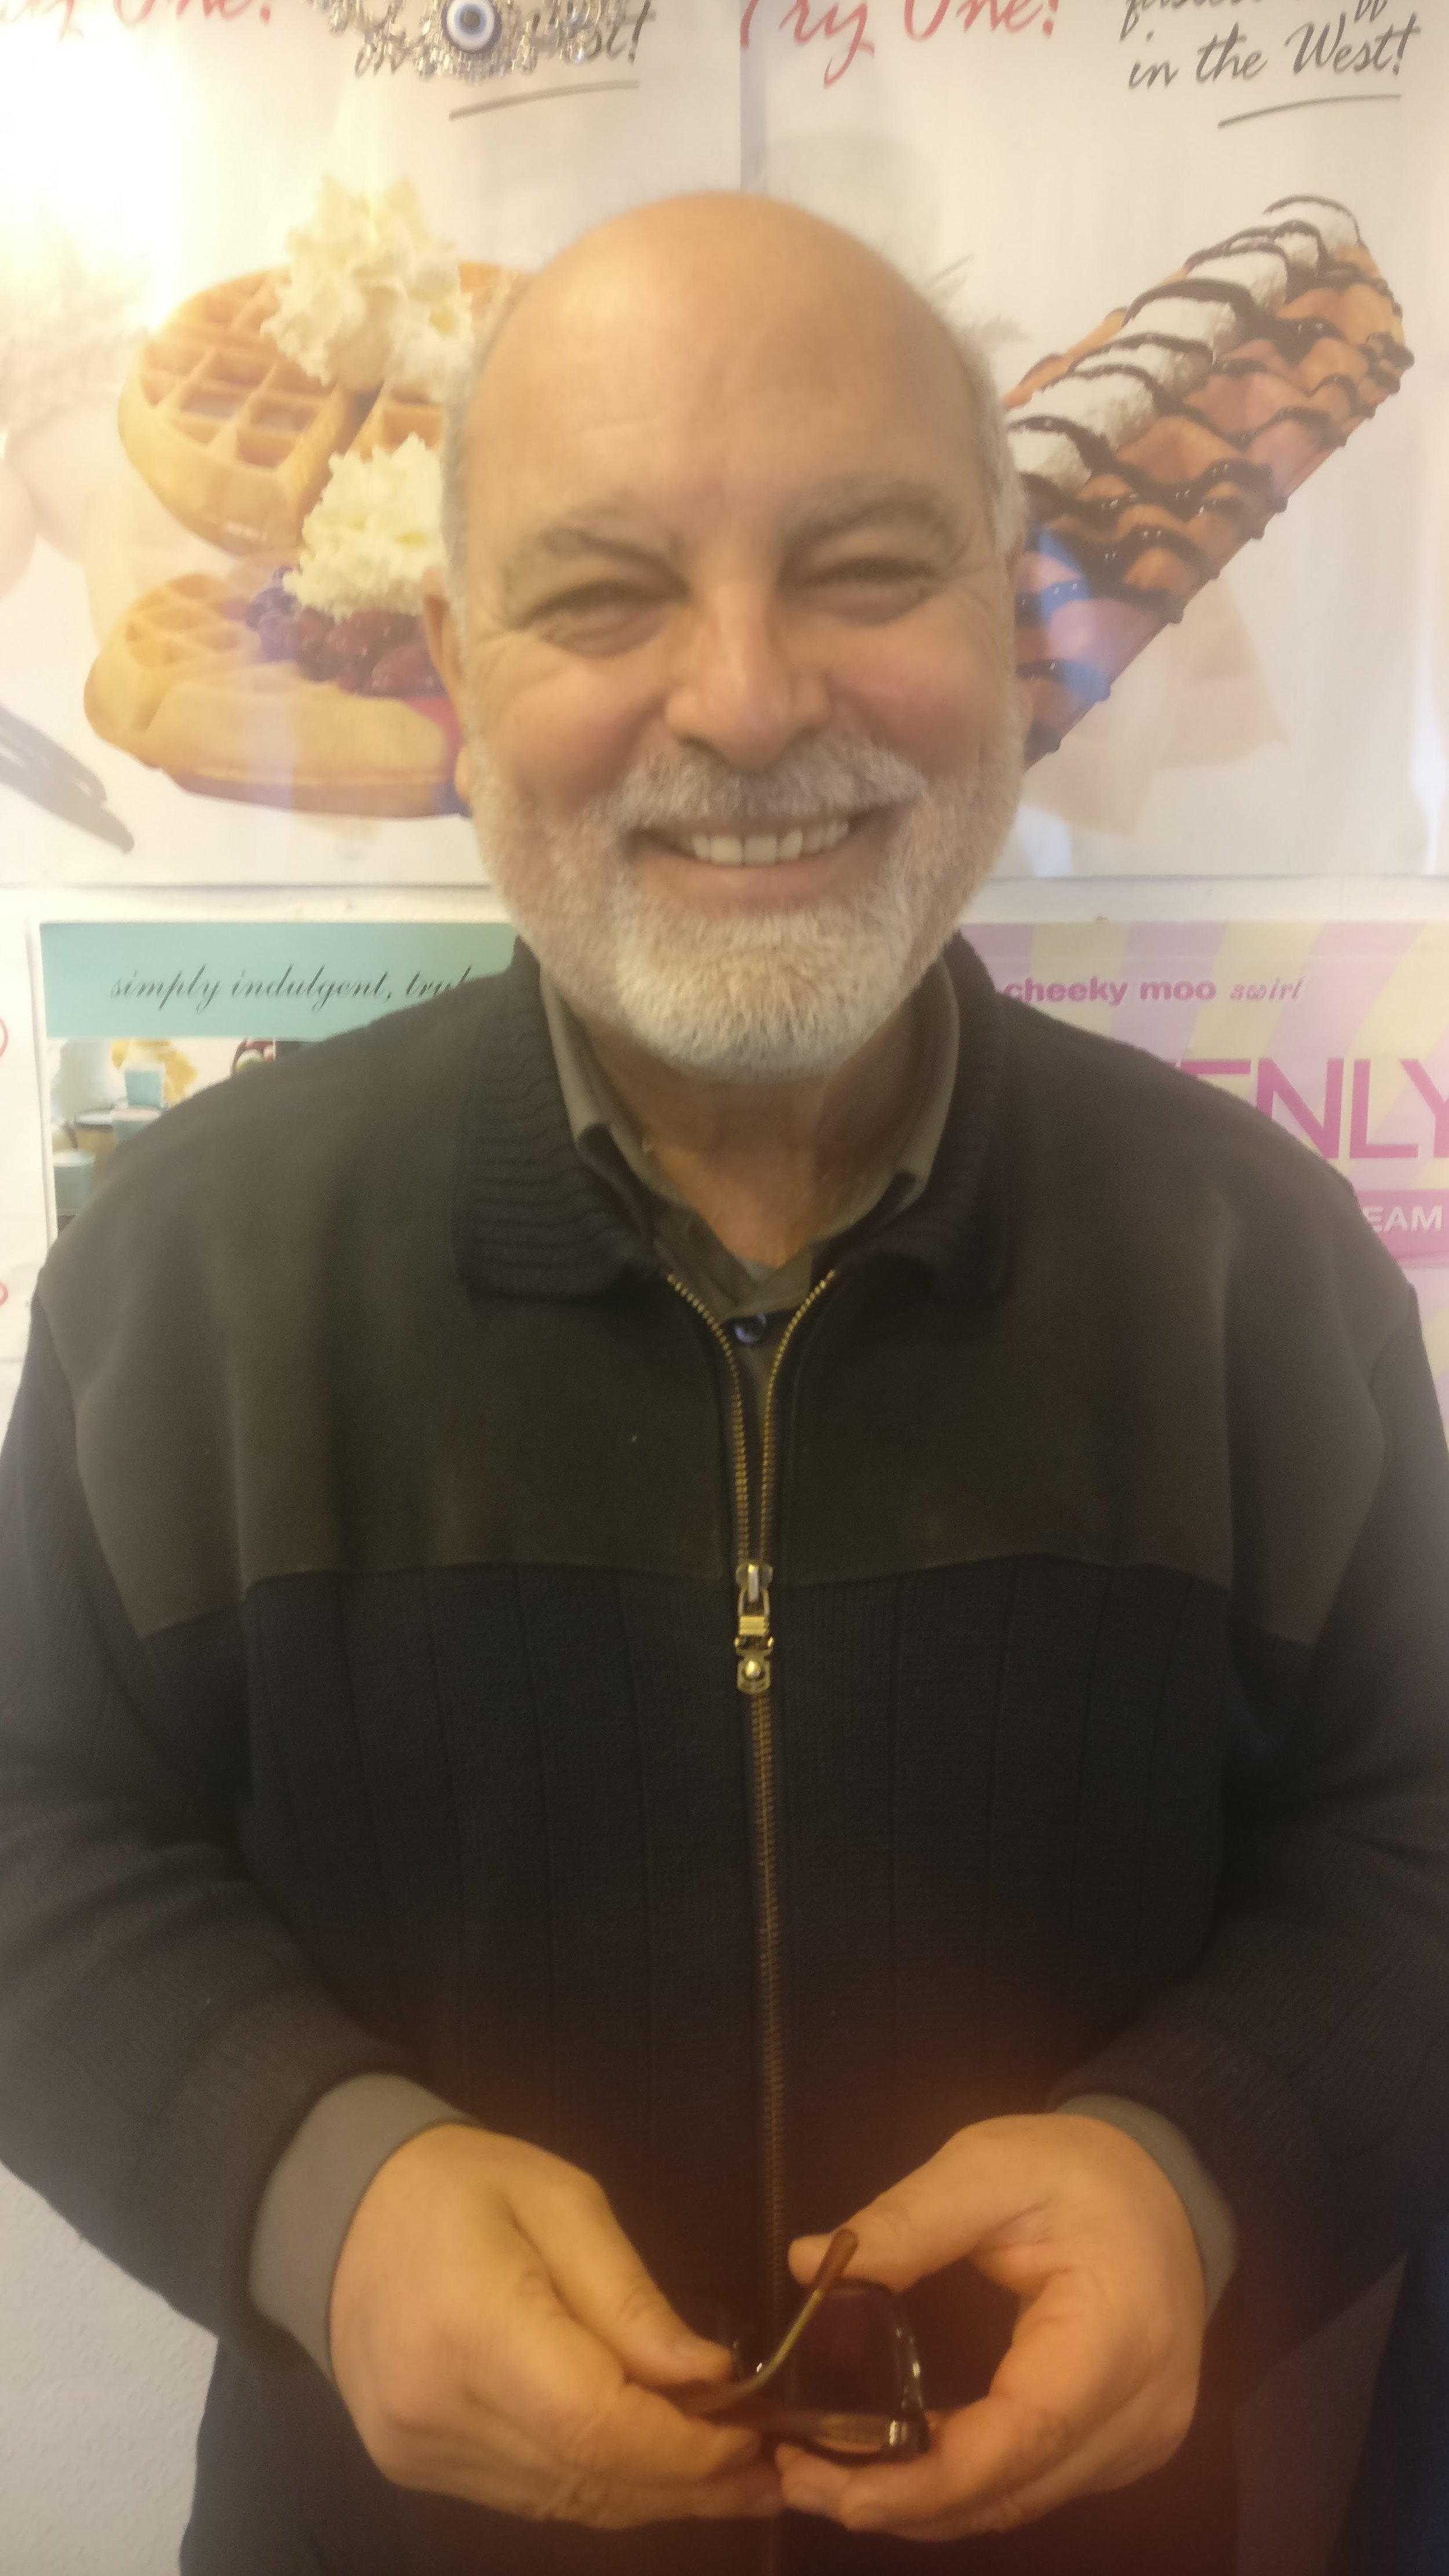 Ghassan Tania's Cafe Hampstead Mums